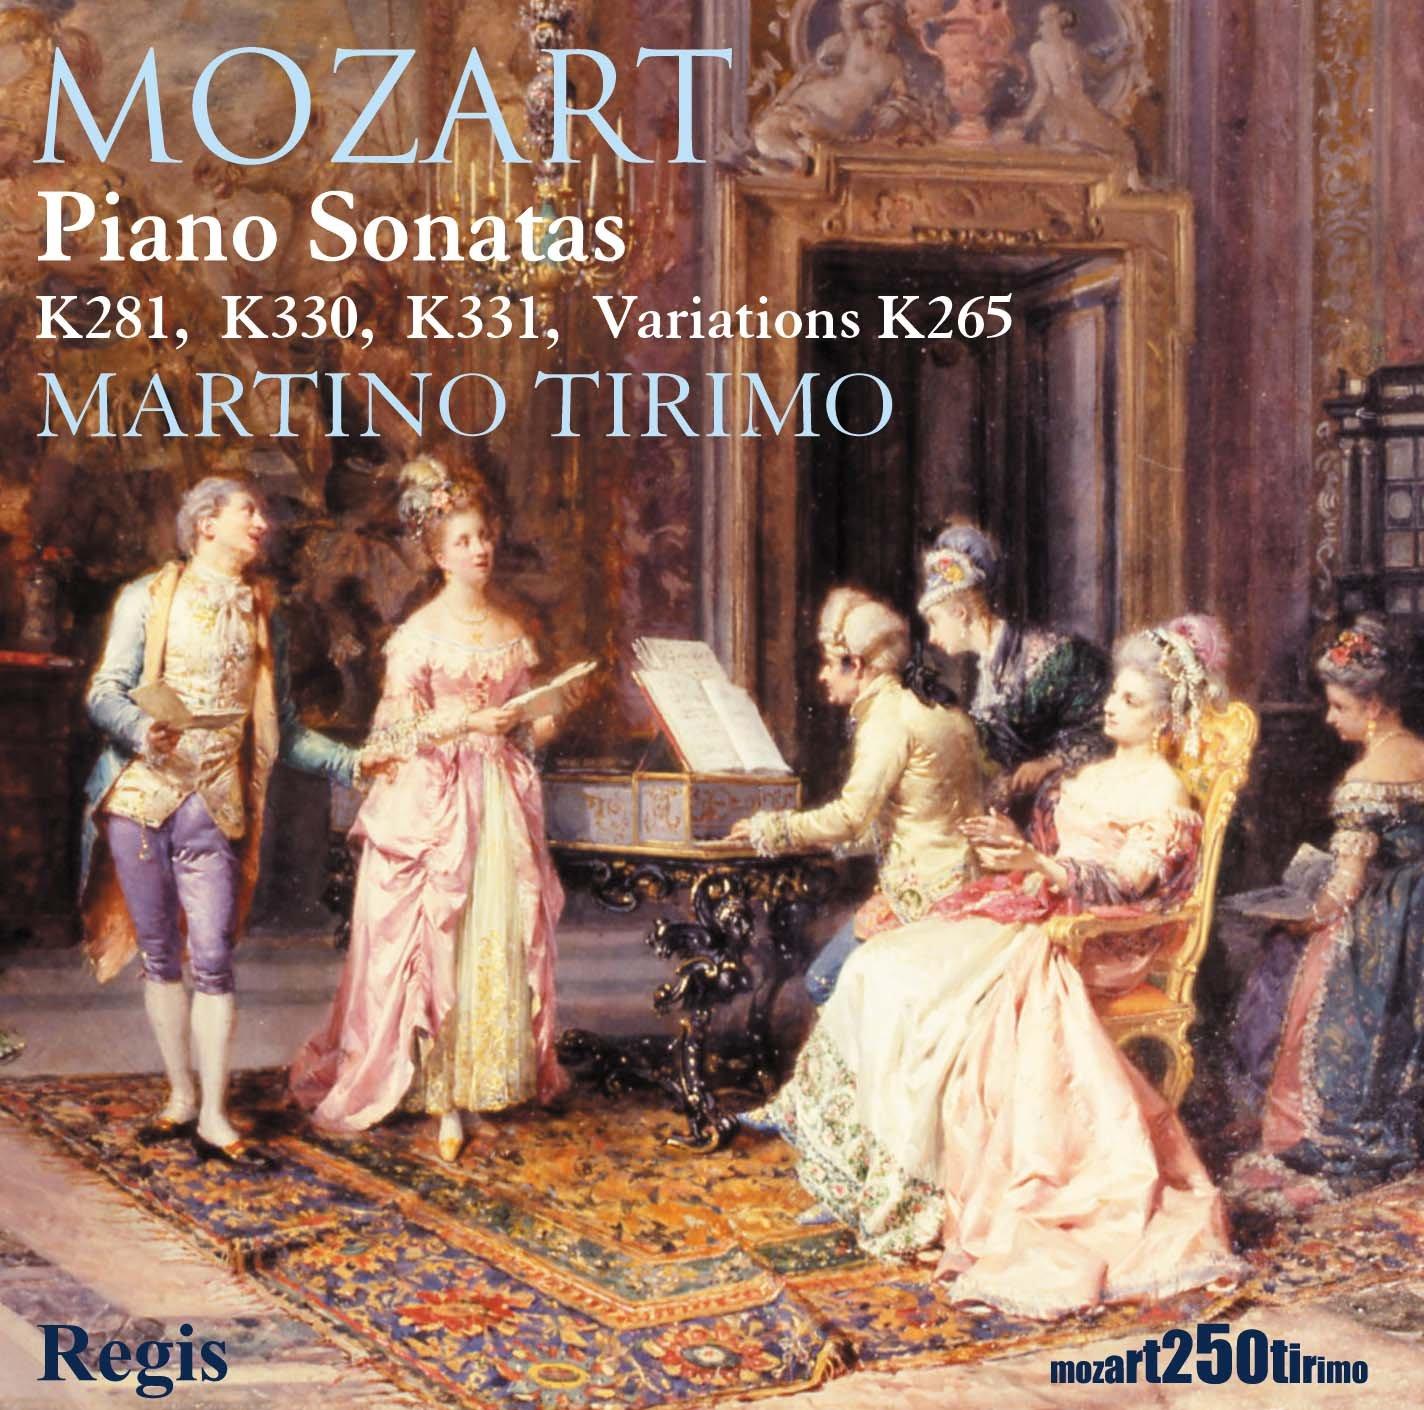 Mozart: Piano Sonatas K281, 330, 331 & Variations K265 by Regis Records